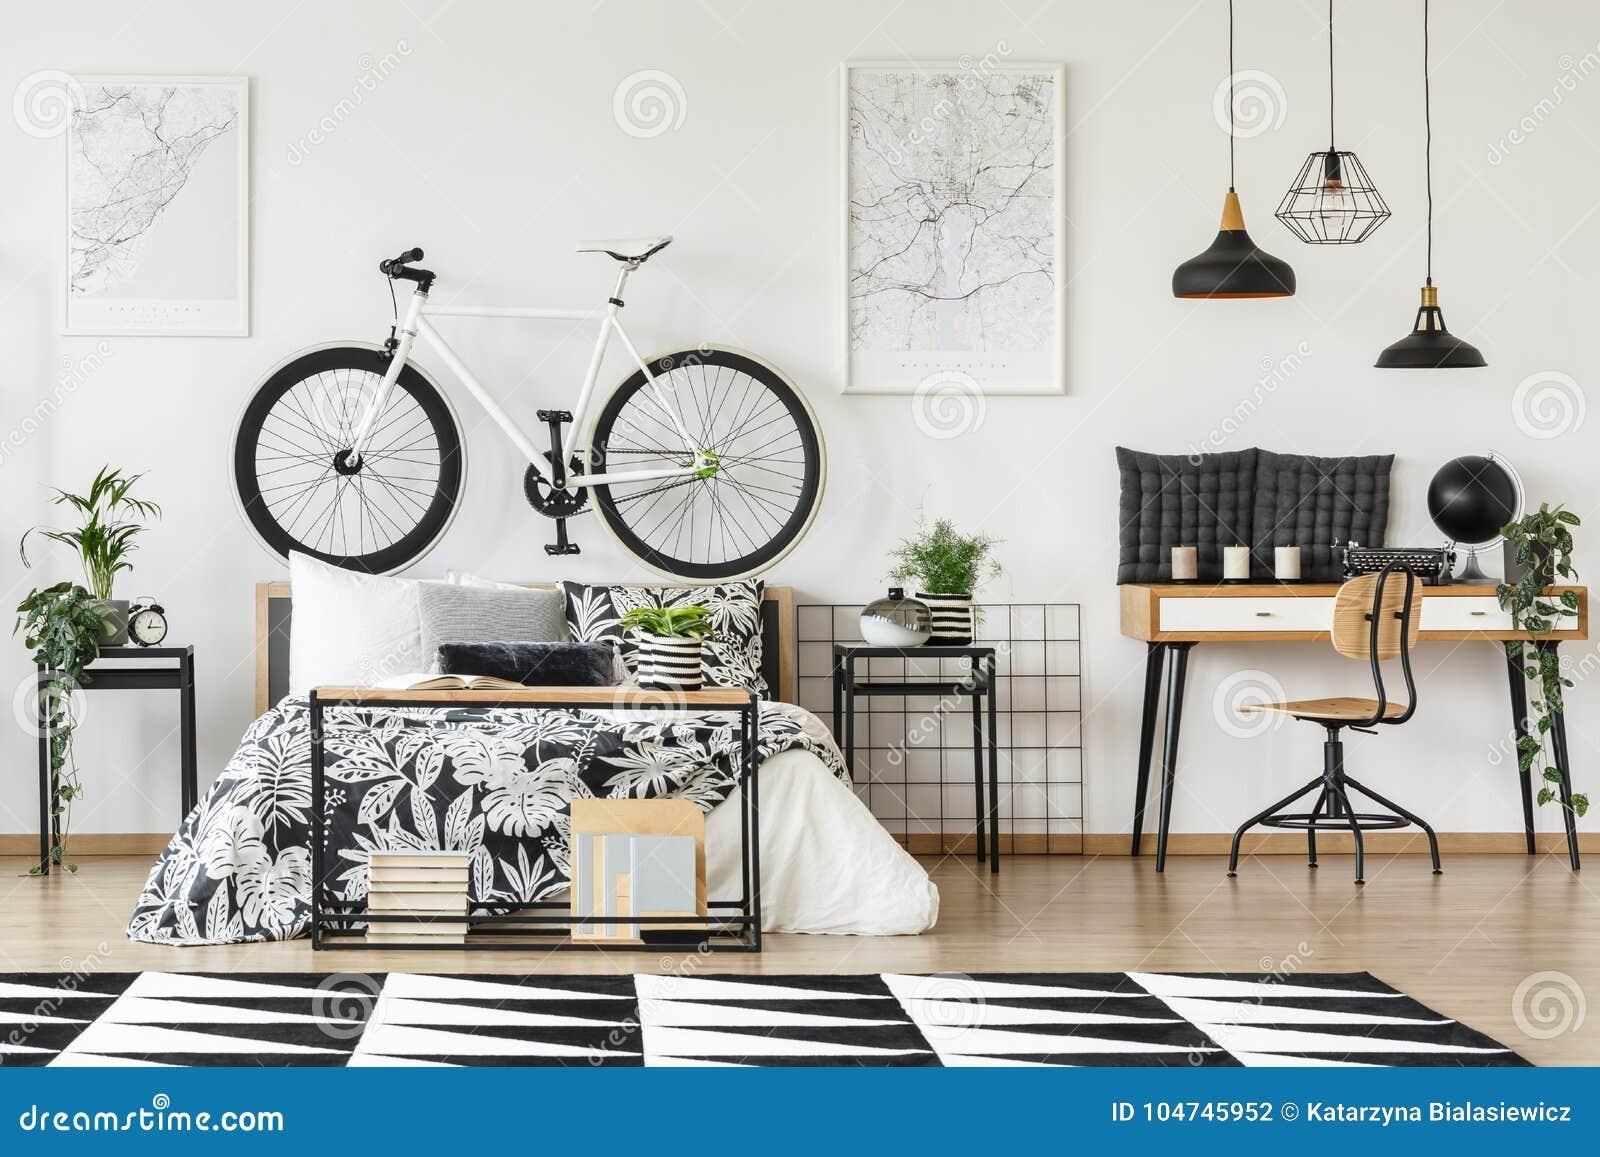 Fahrrad auf bedhead